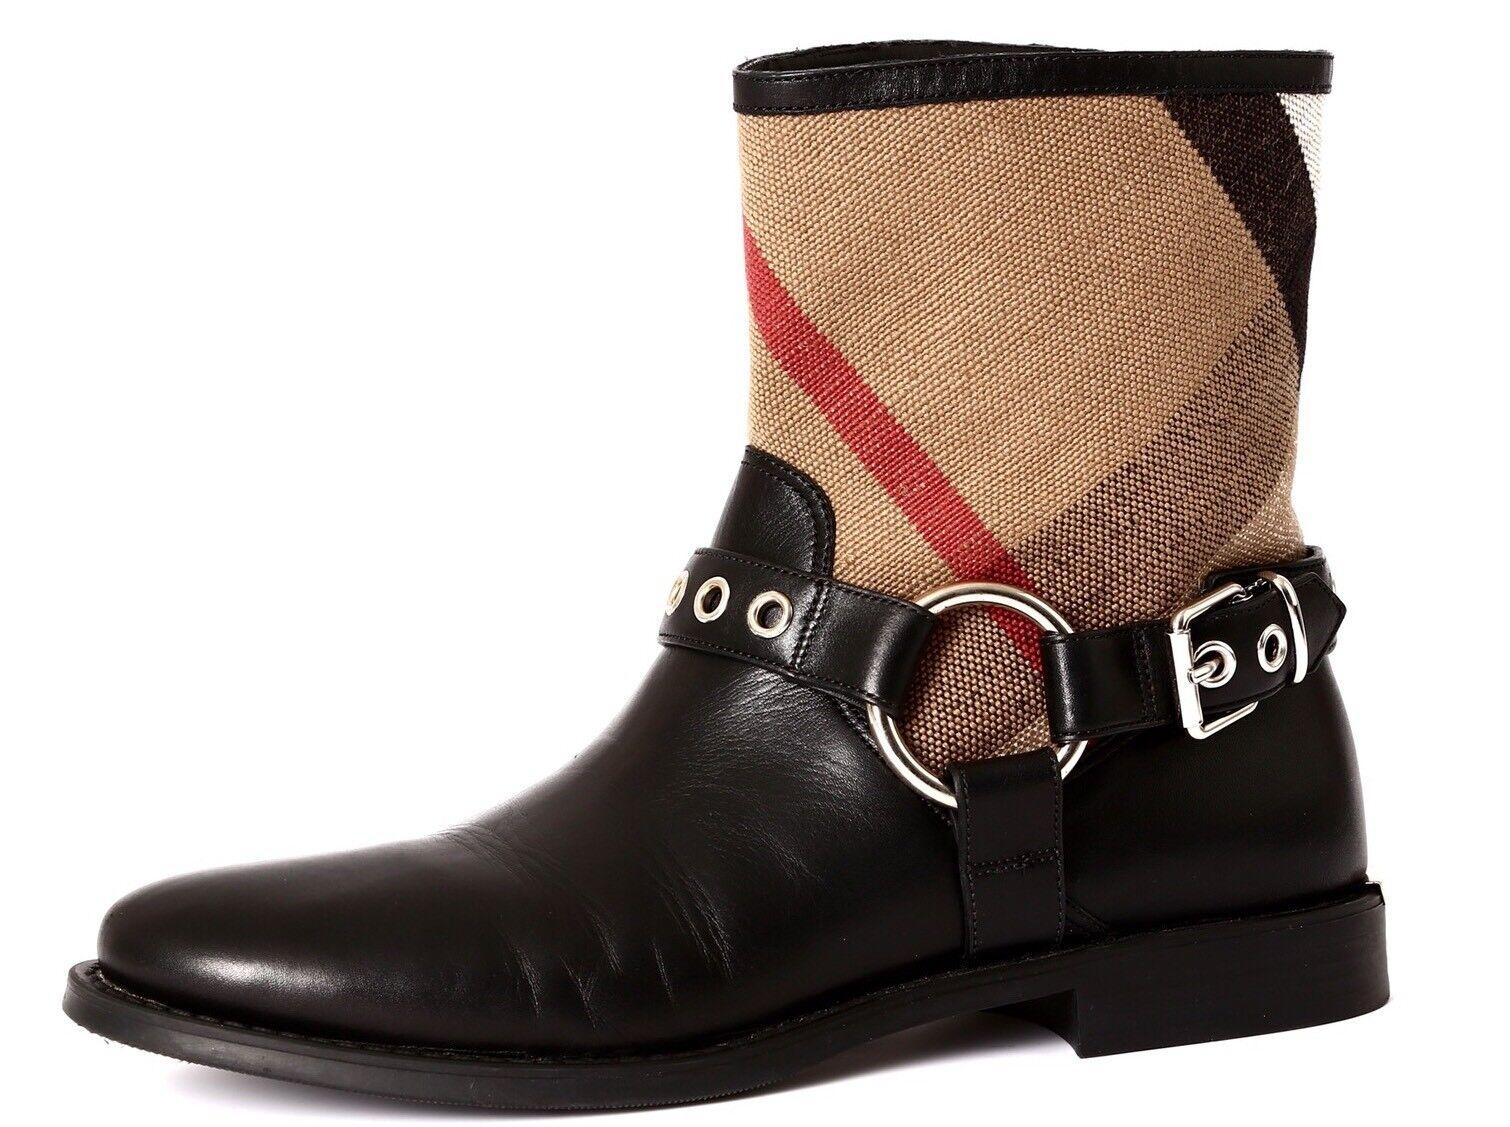 Burberry Queenstead Women's Black Silver Leather Boot Sz 37.5